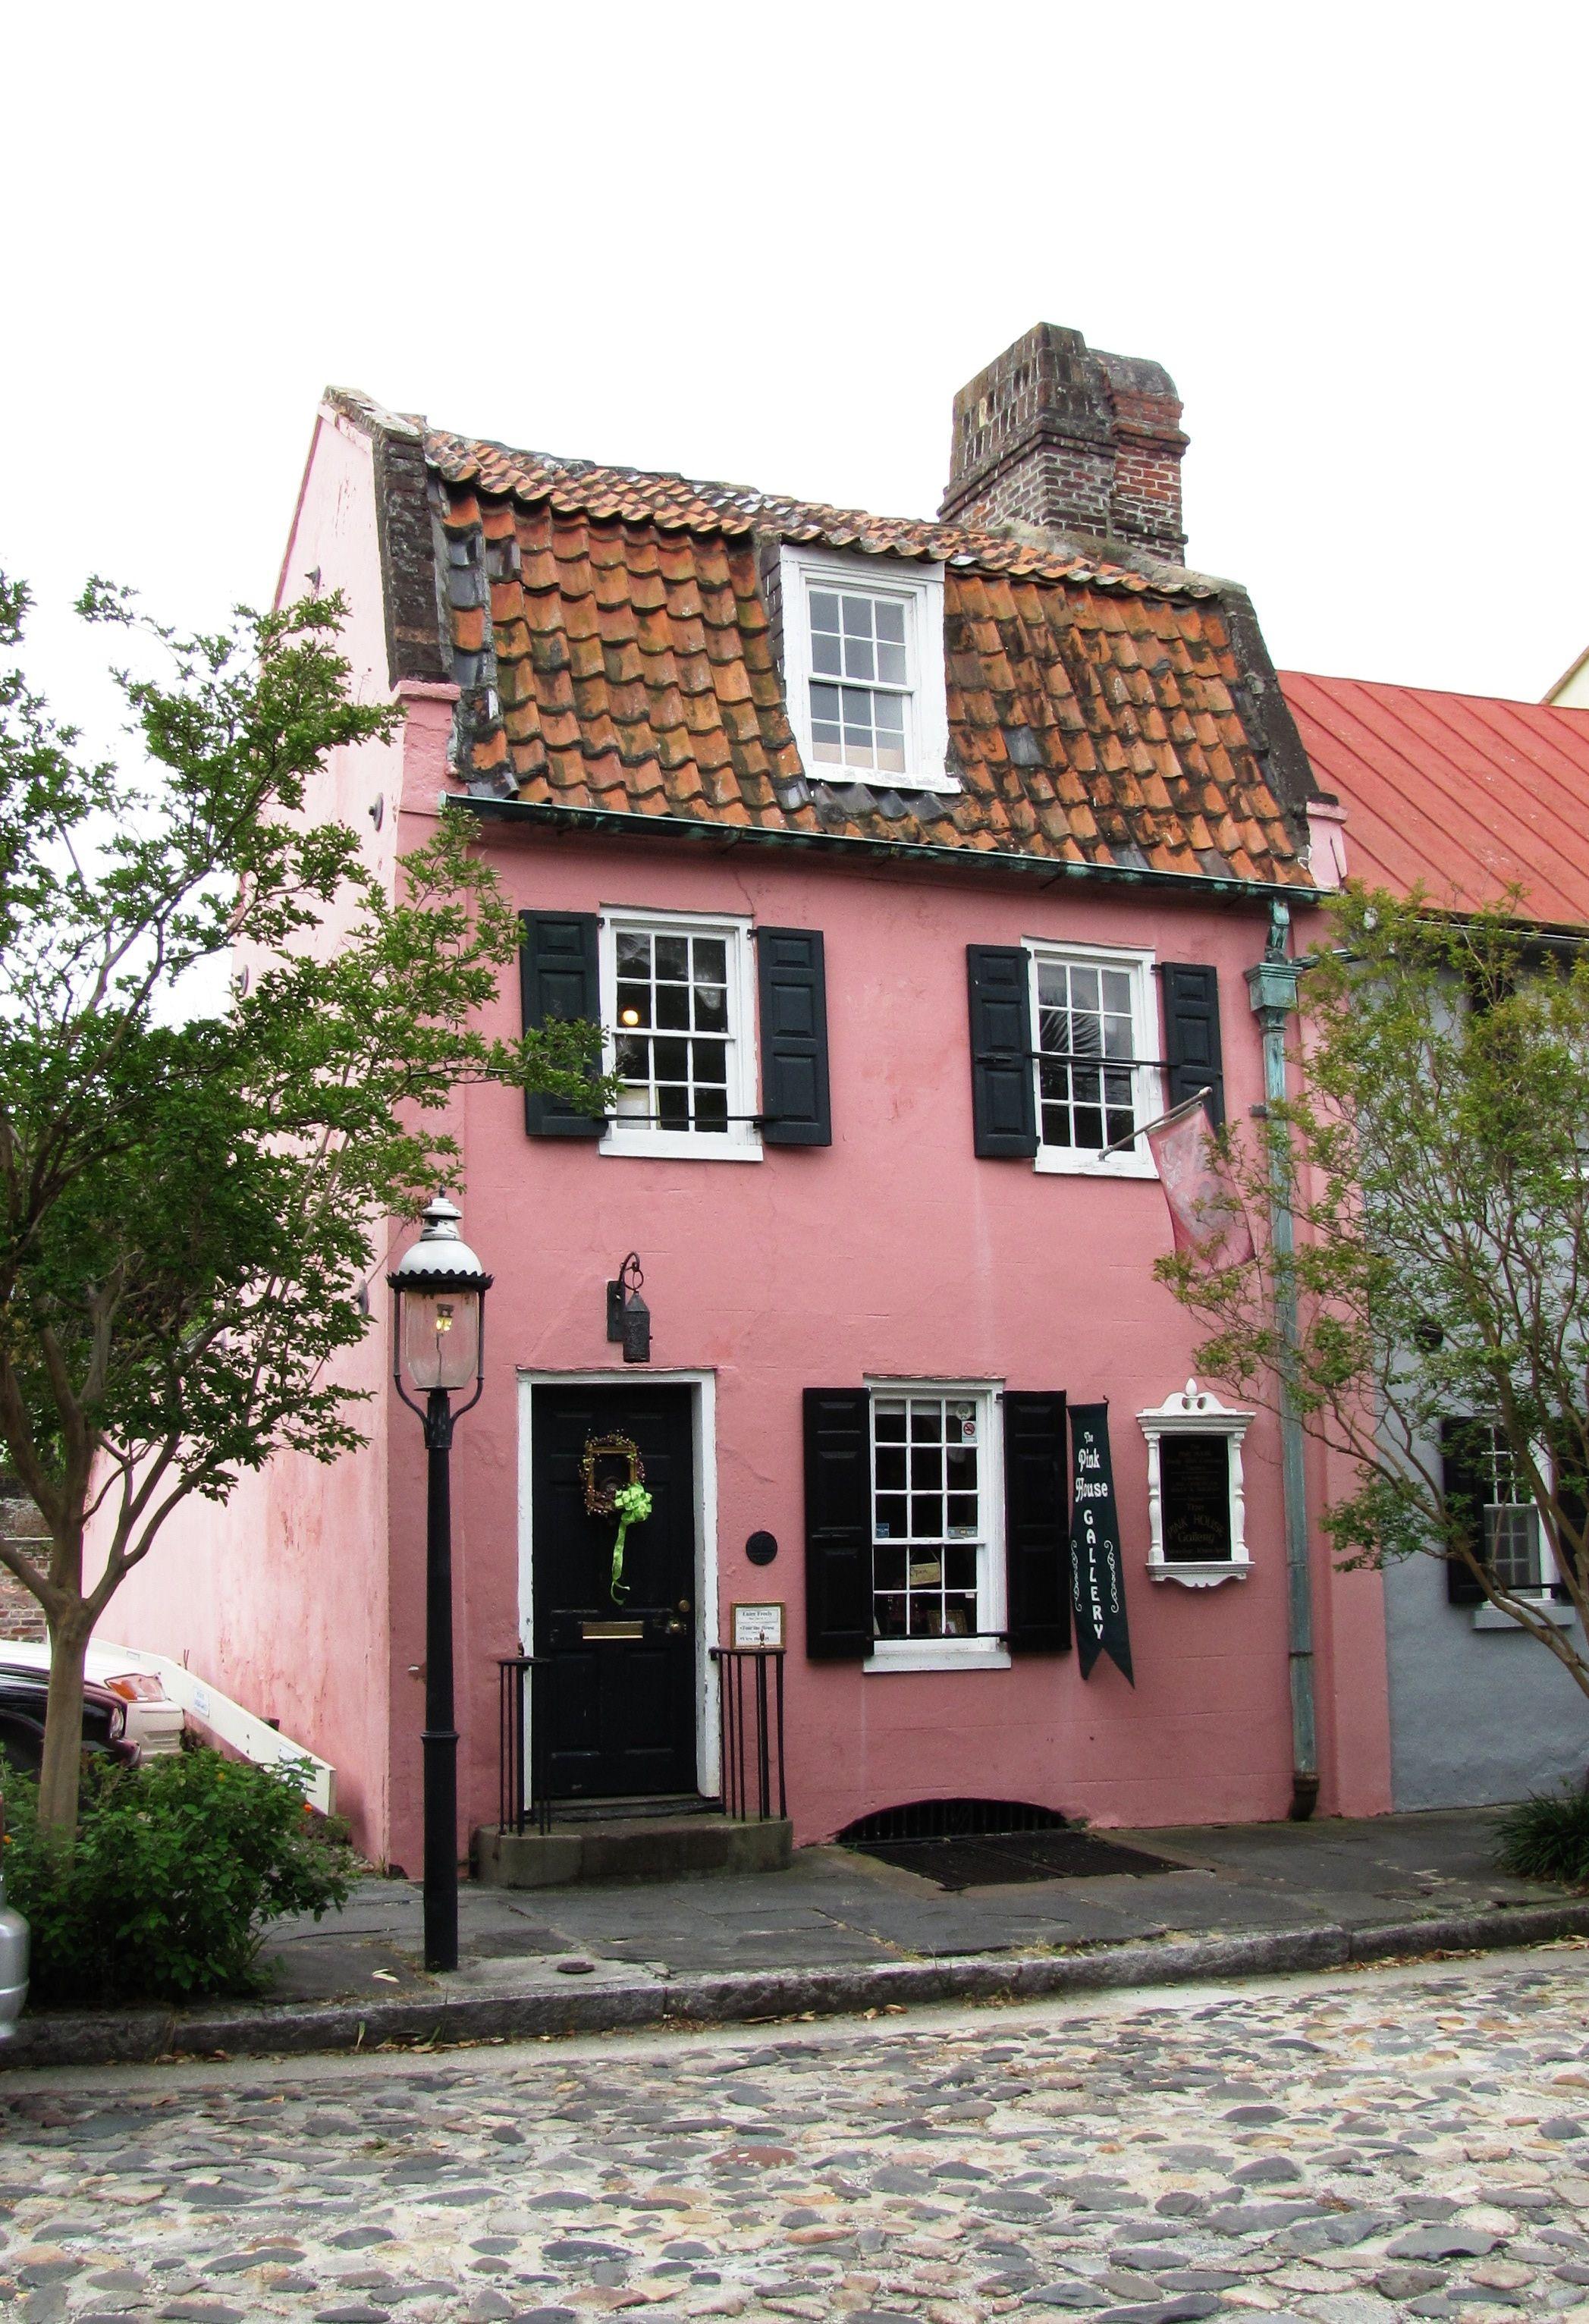 North charleston south carolina city information epodunk - North Charleston South Carolina City Information Epodunk The Pink House The Oldest Stone Building In Download